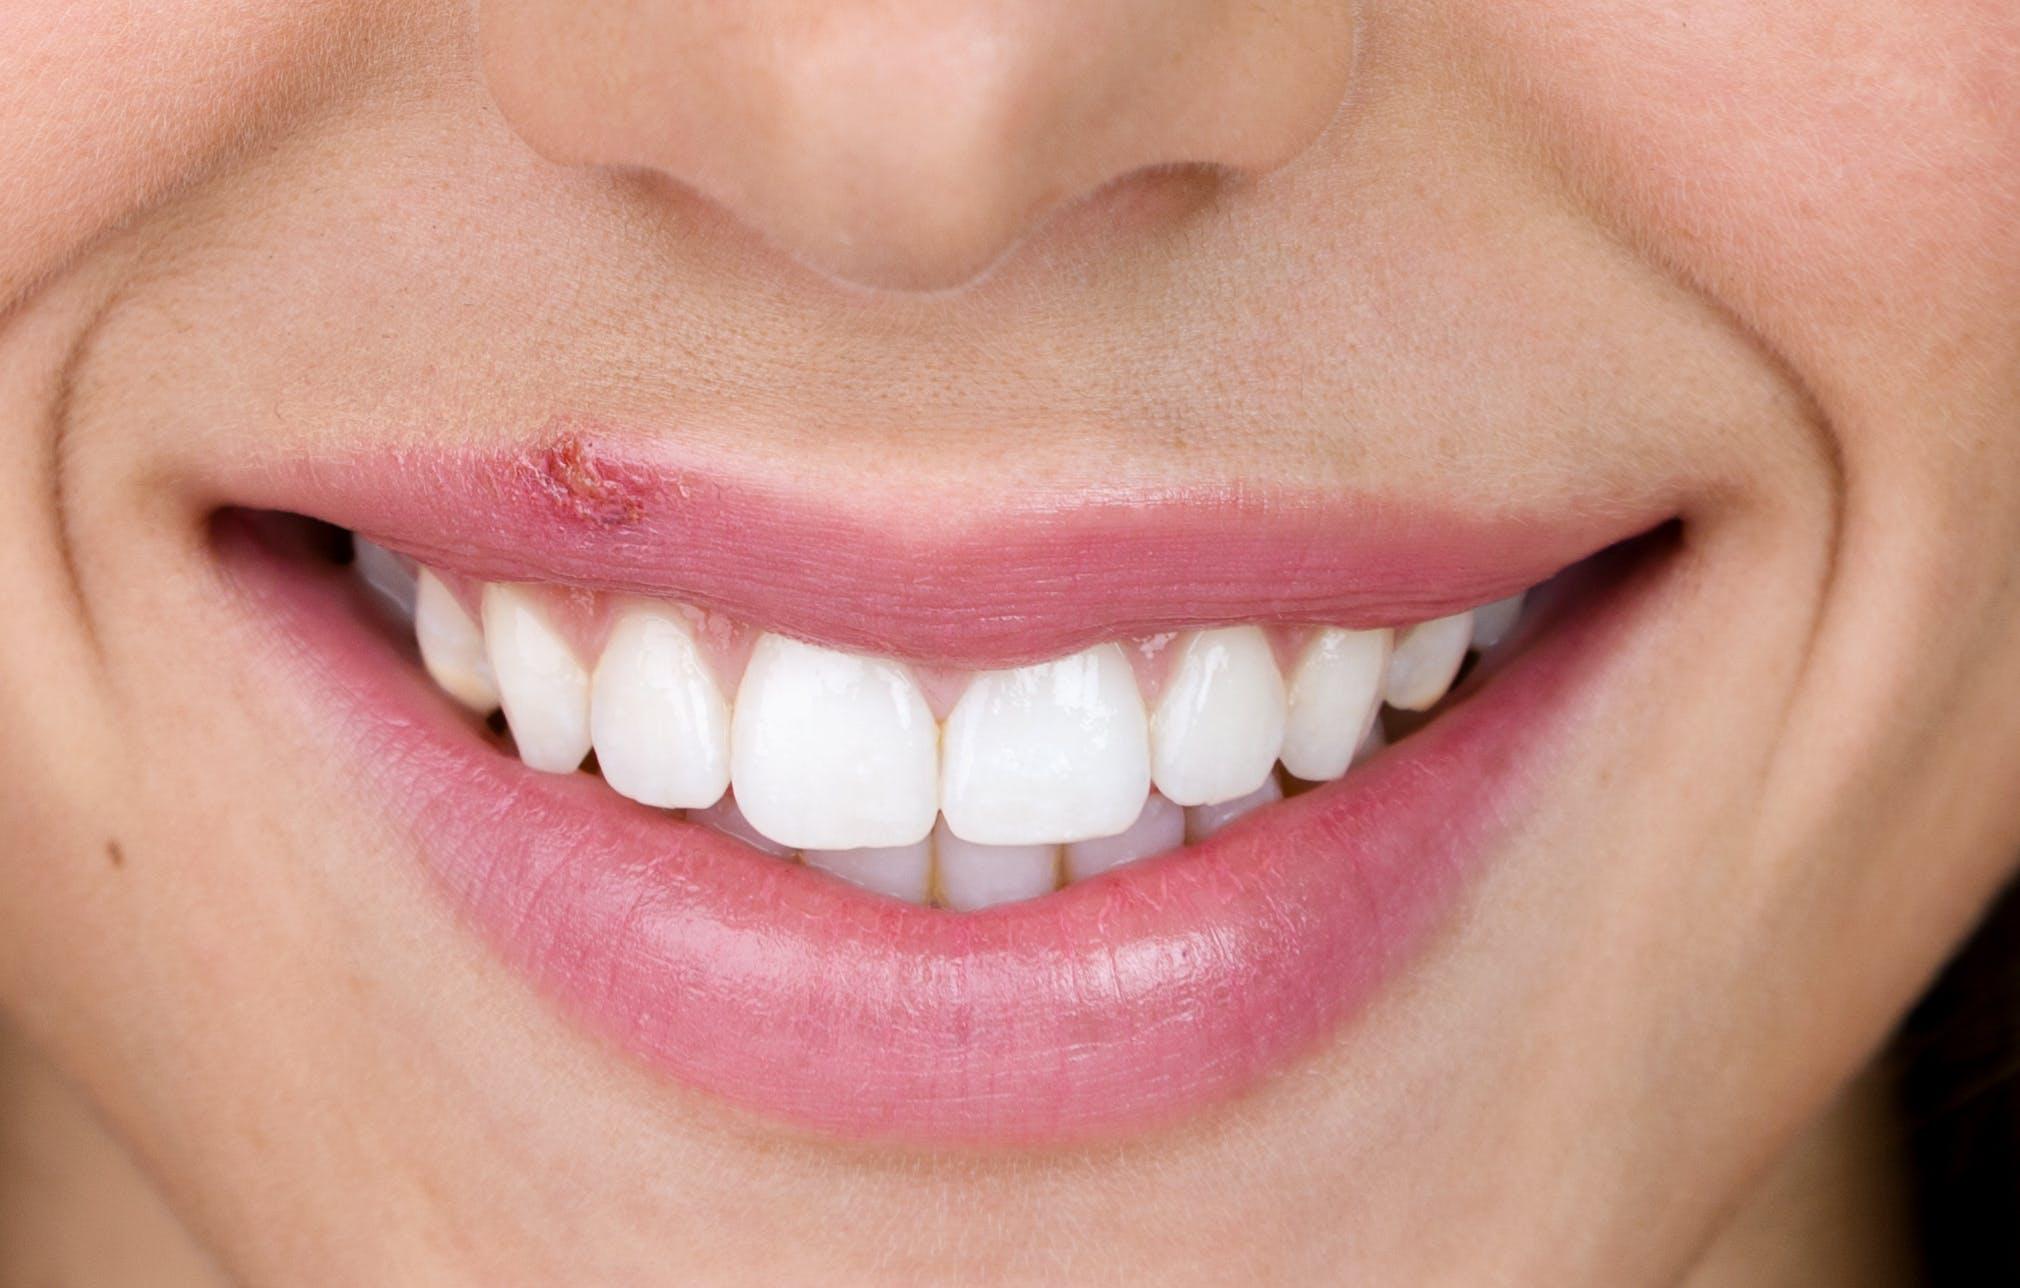 Cold sore on women's top lip